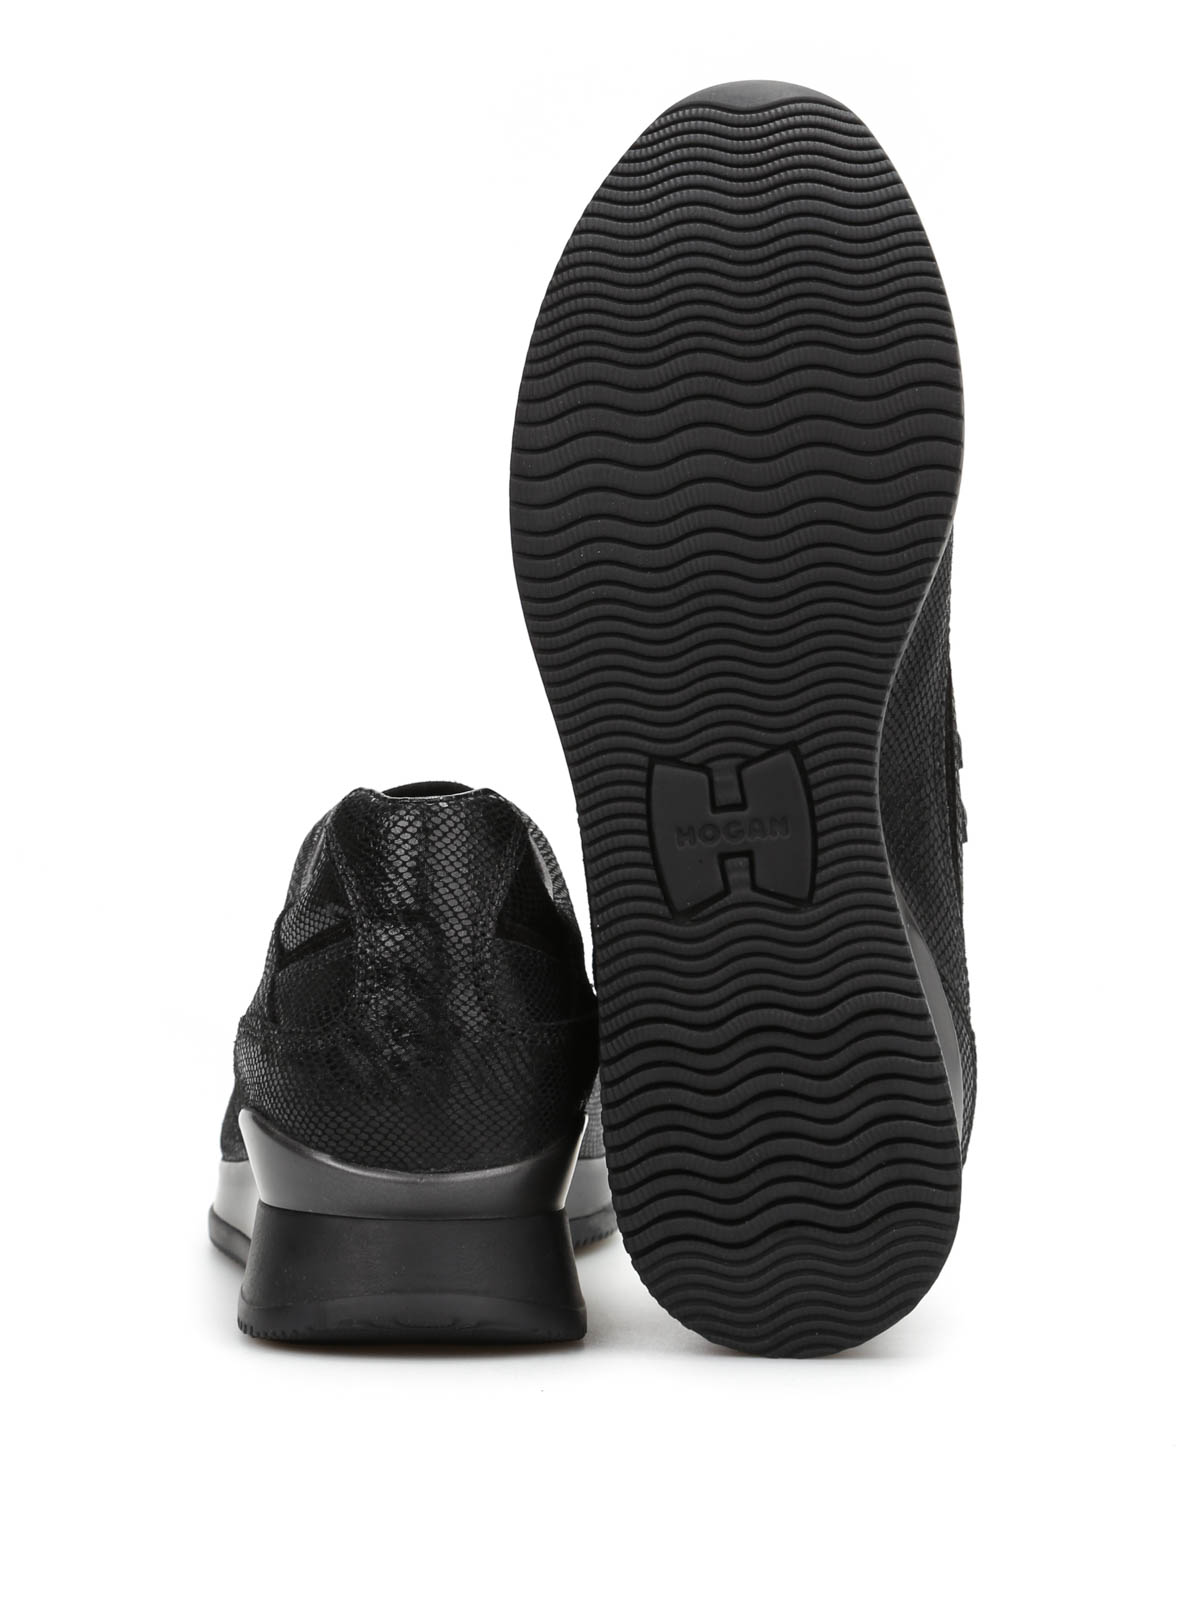 e769c171a1 Hogan - Elective sneakers - trainers - HXW1580A3217YM B999   iKRIX.com